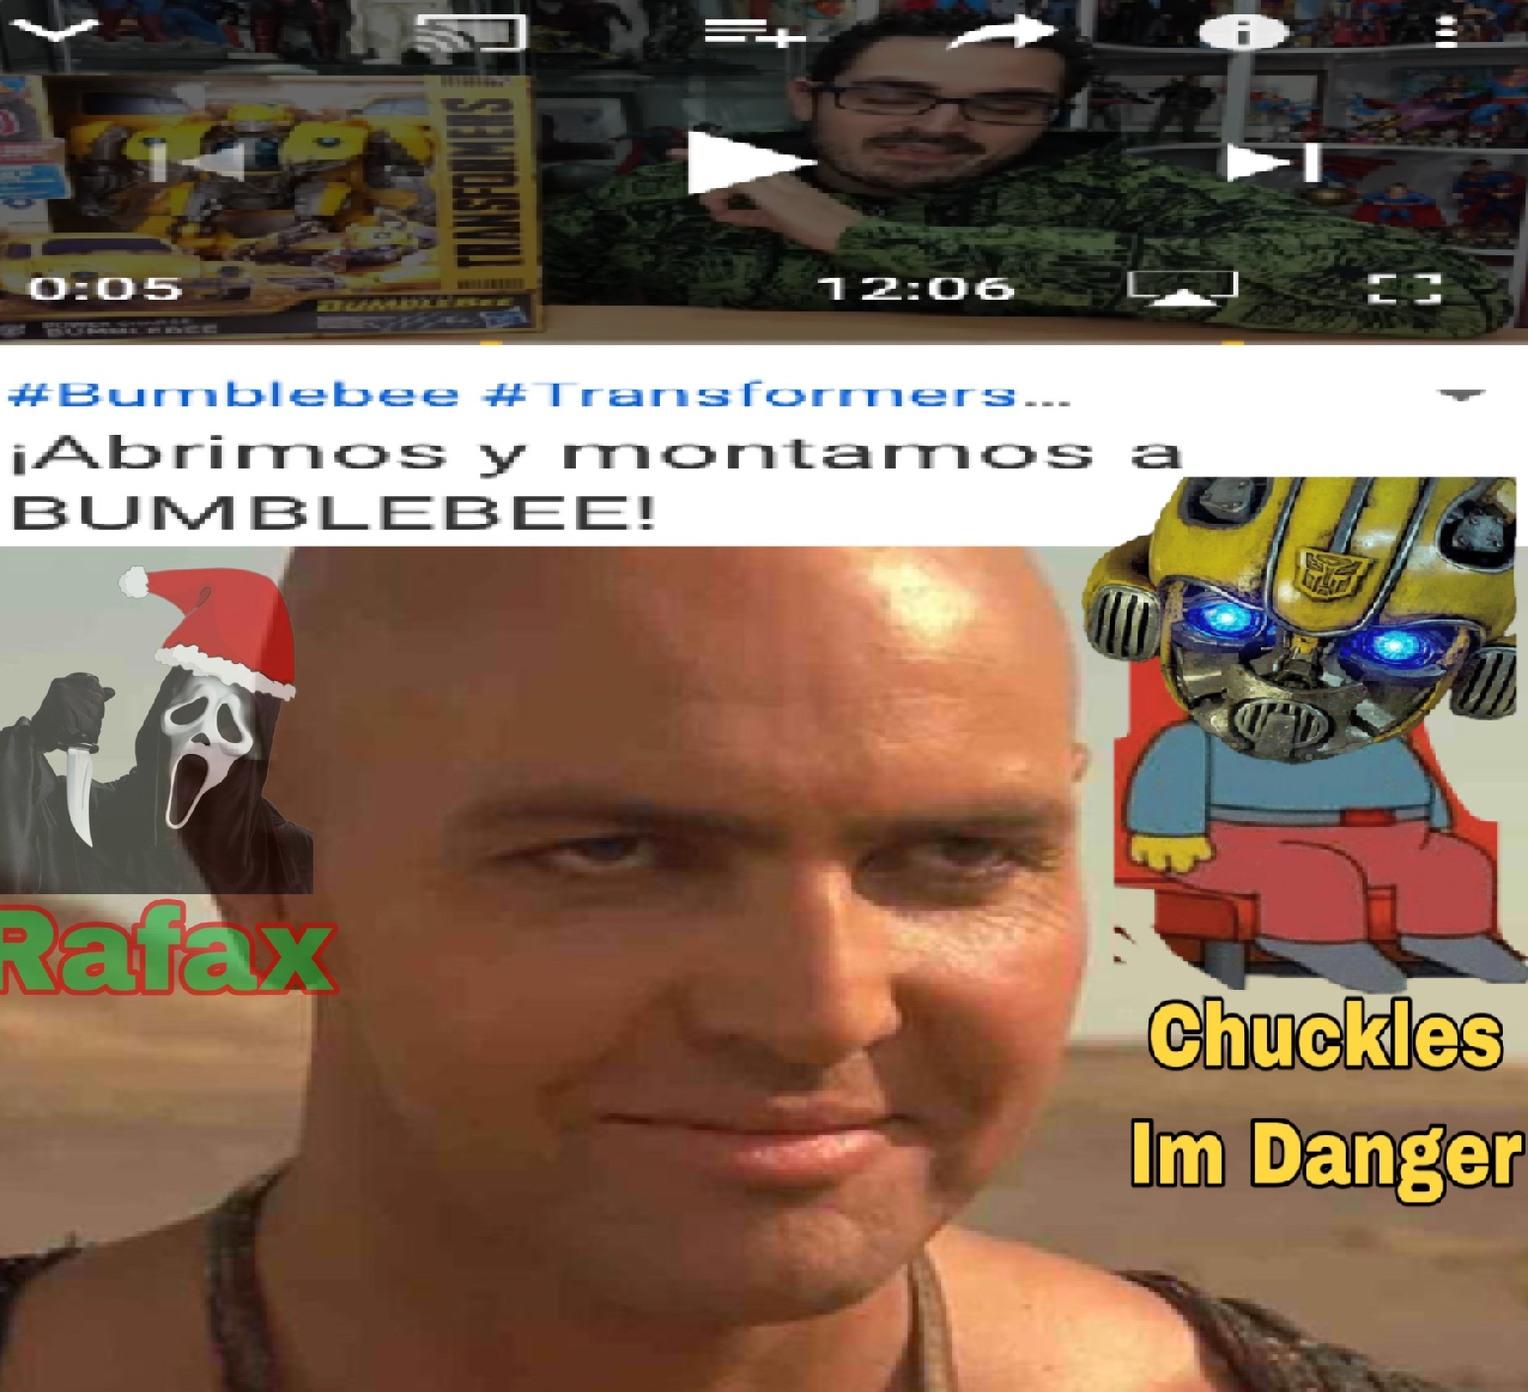 Uff Sexo Robótico - meme